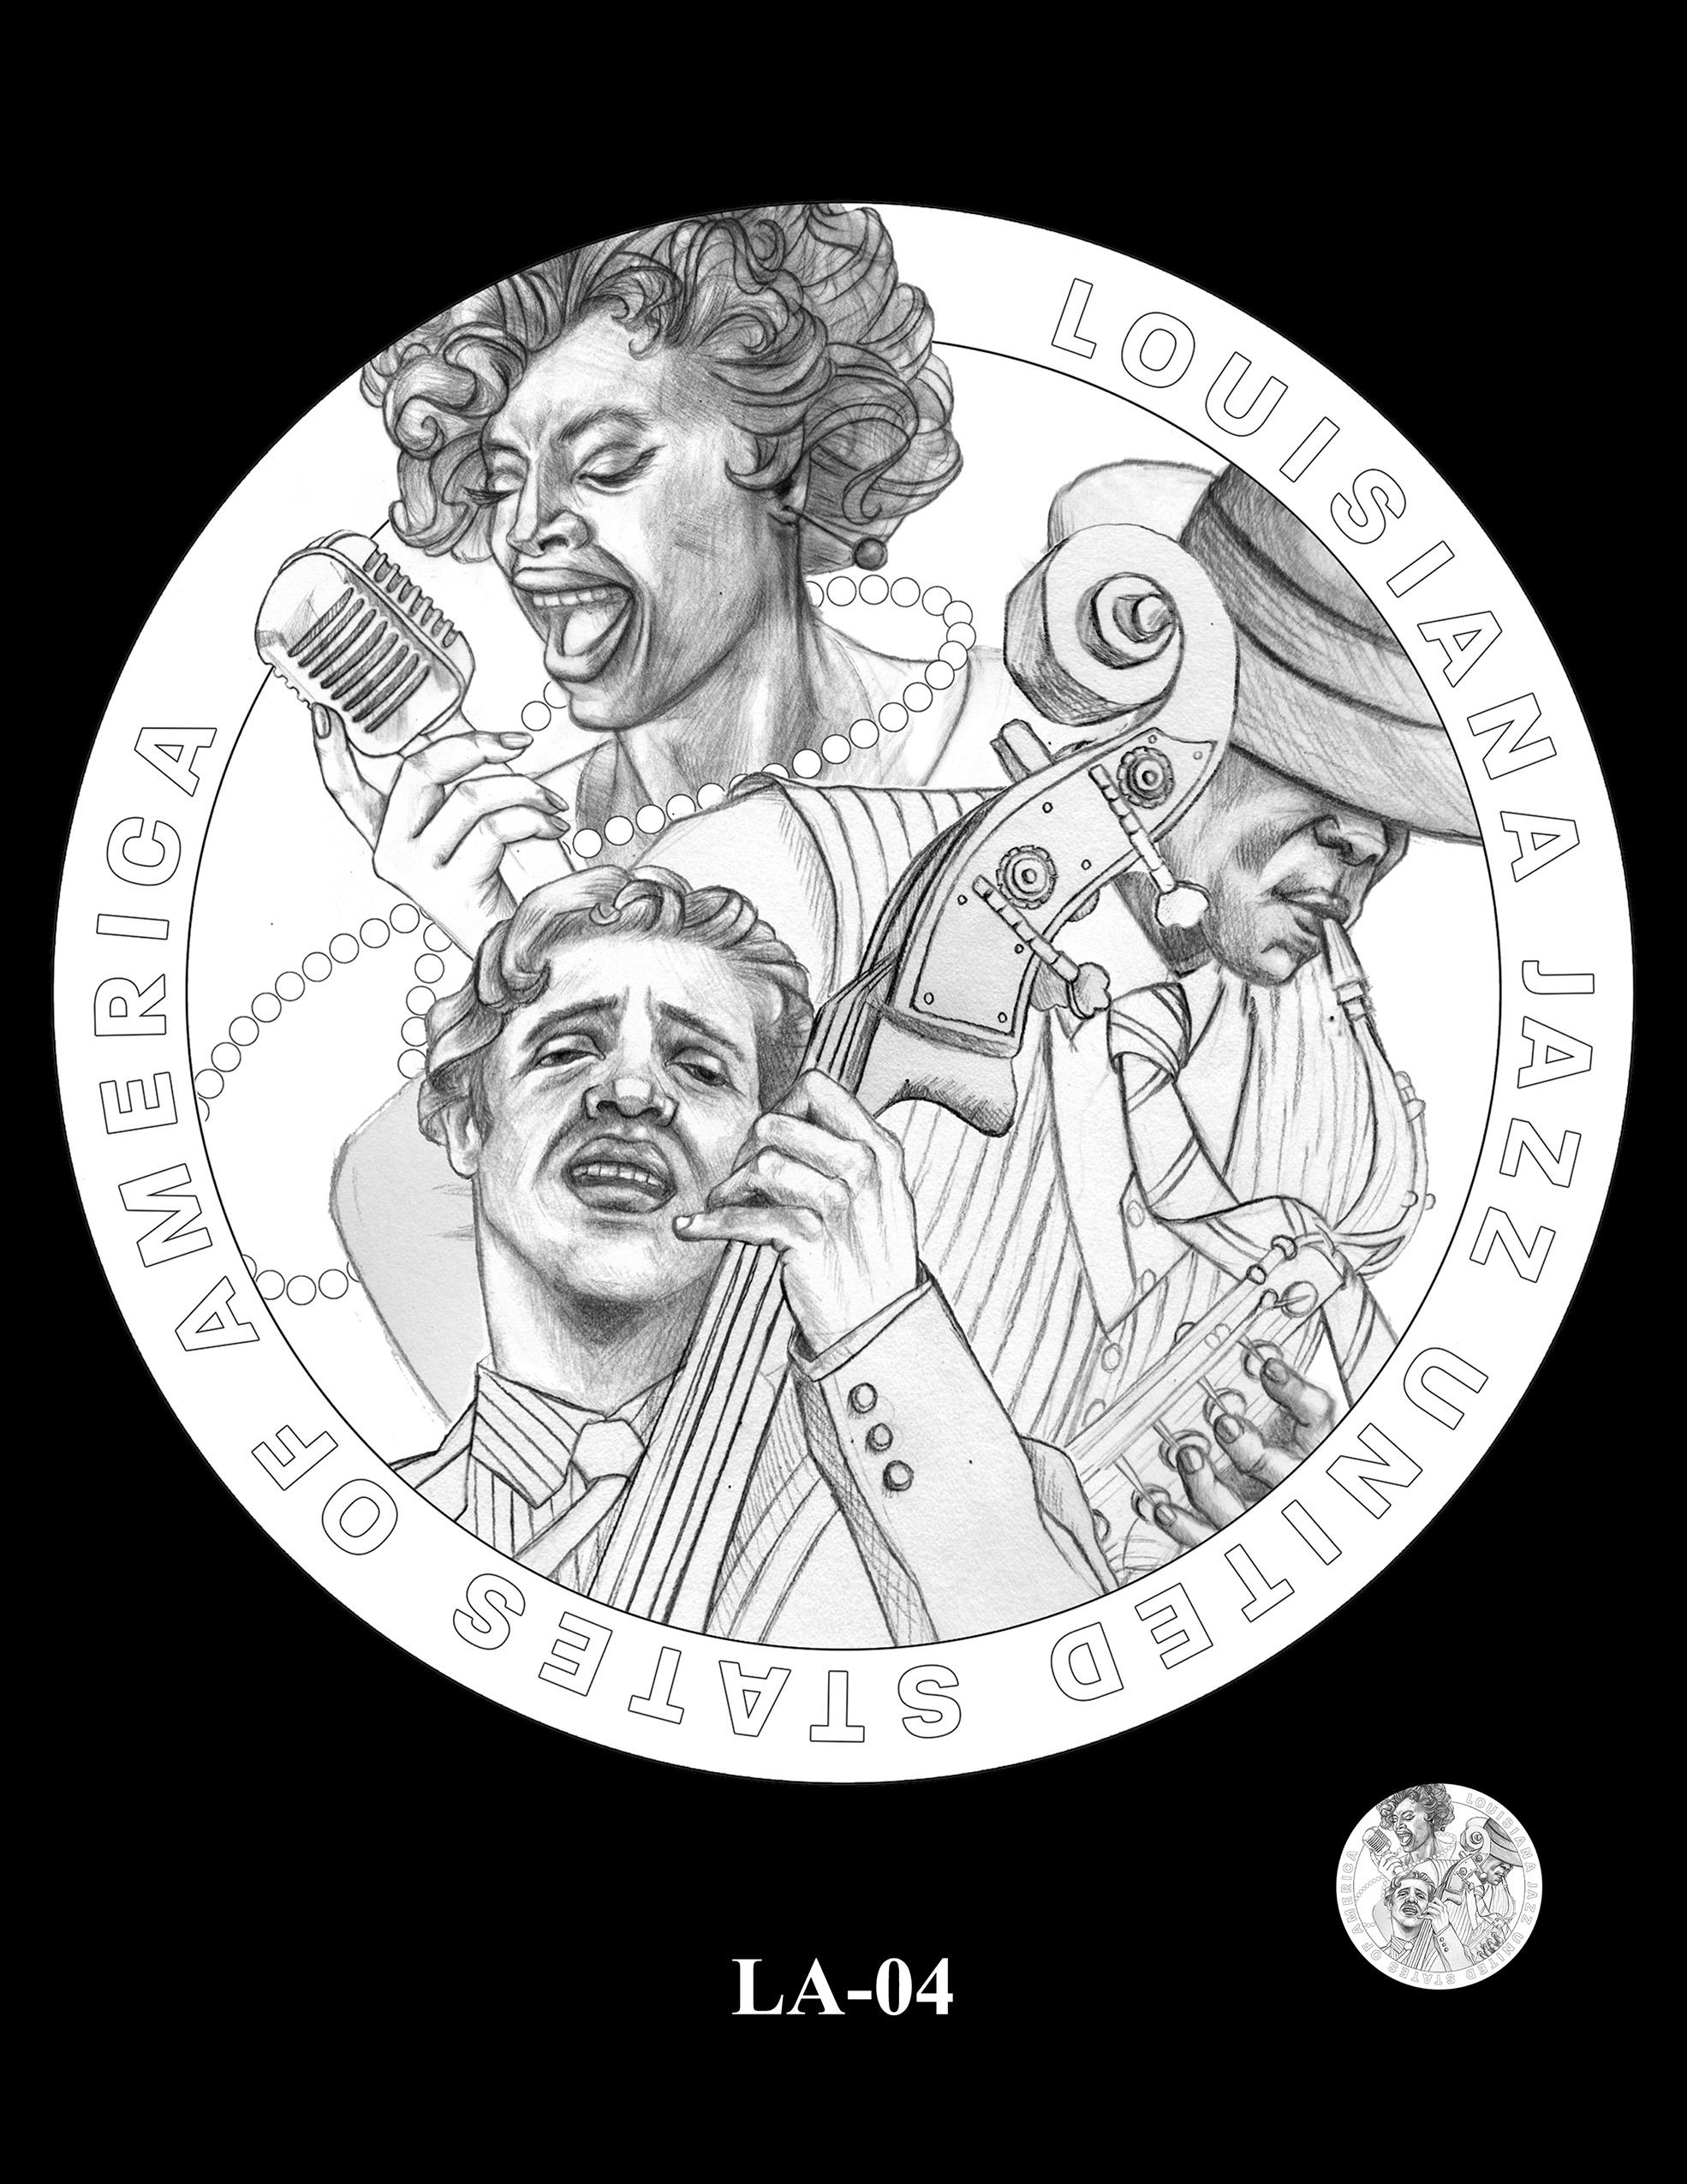 LA-04 -- 2023 American Innovation $1 Coin Program - Louisiana